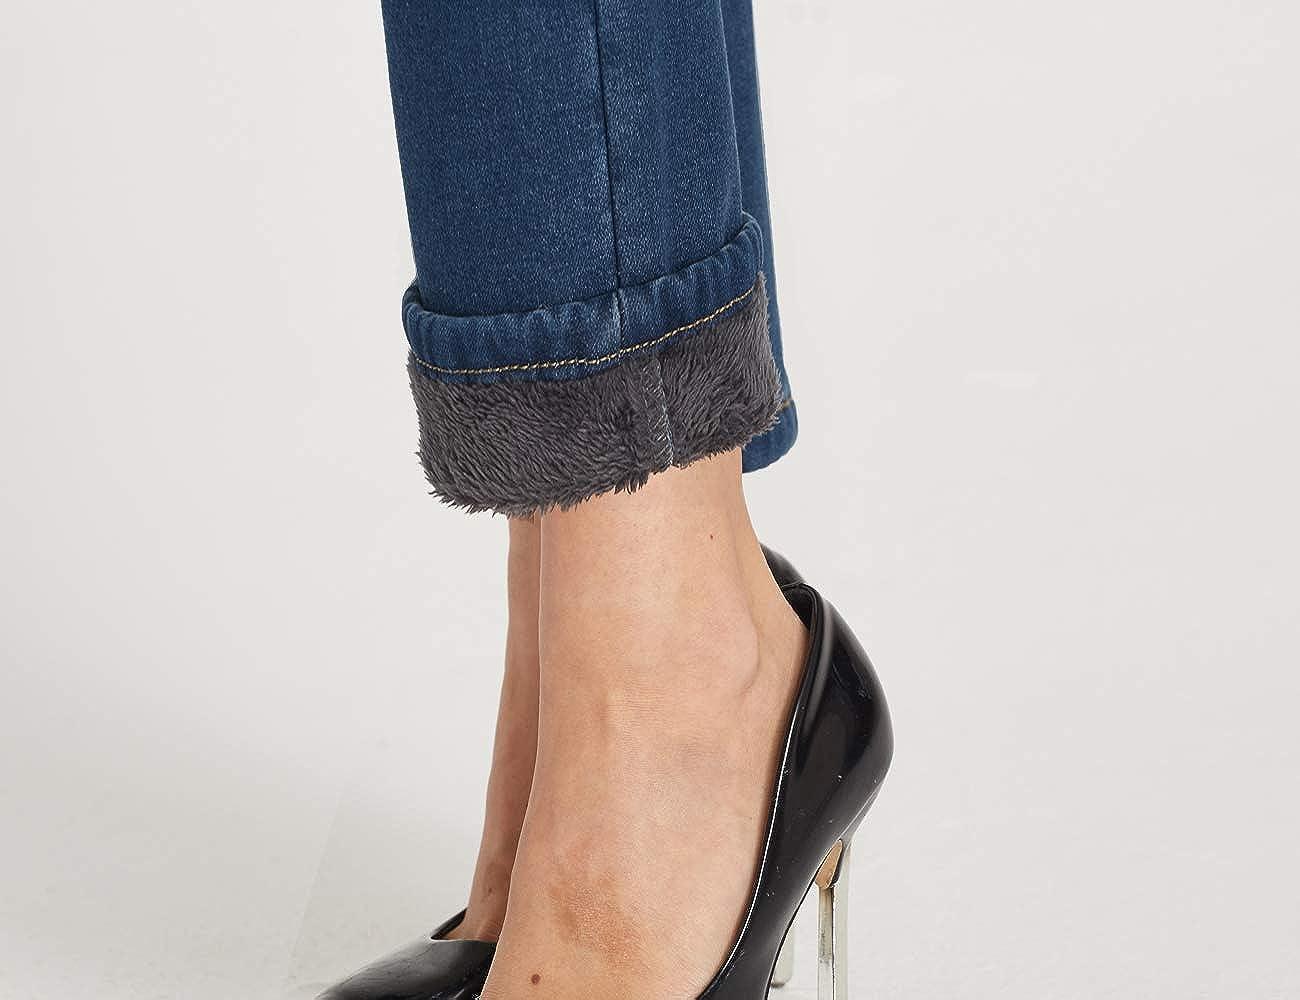 Camii Mia Jeans Skinny Femme Polaire Slim Fit /Épais